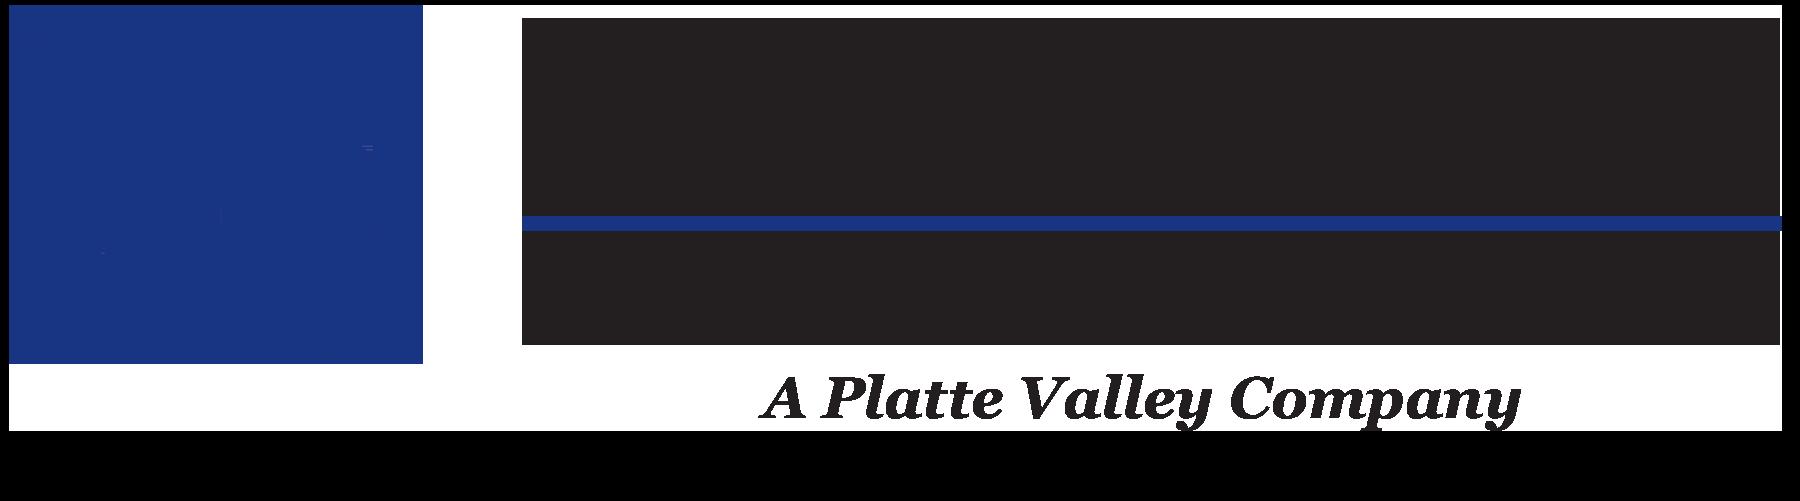 JGE Blue&Black Logo with PVC.png